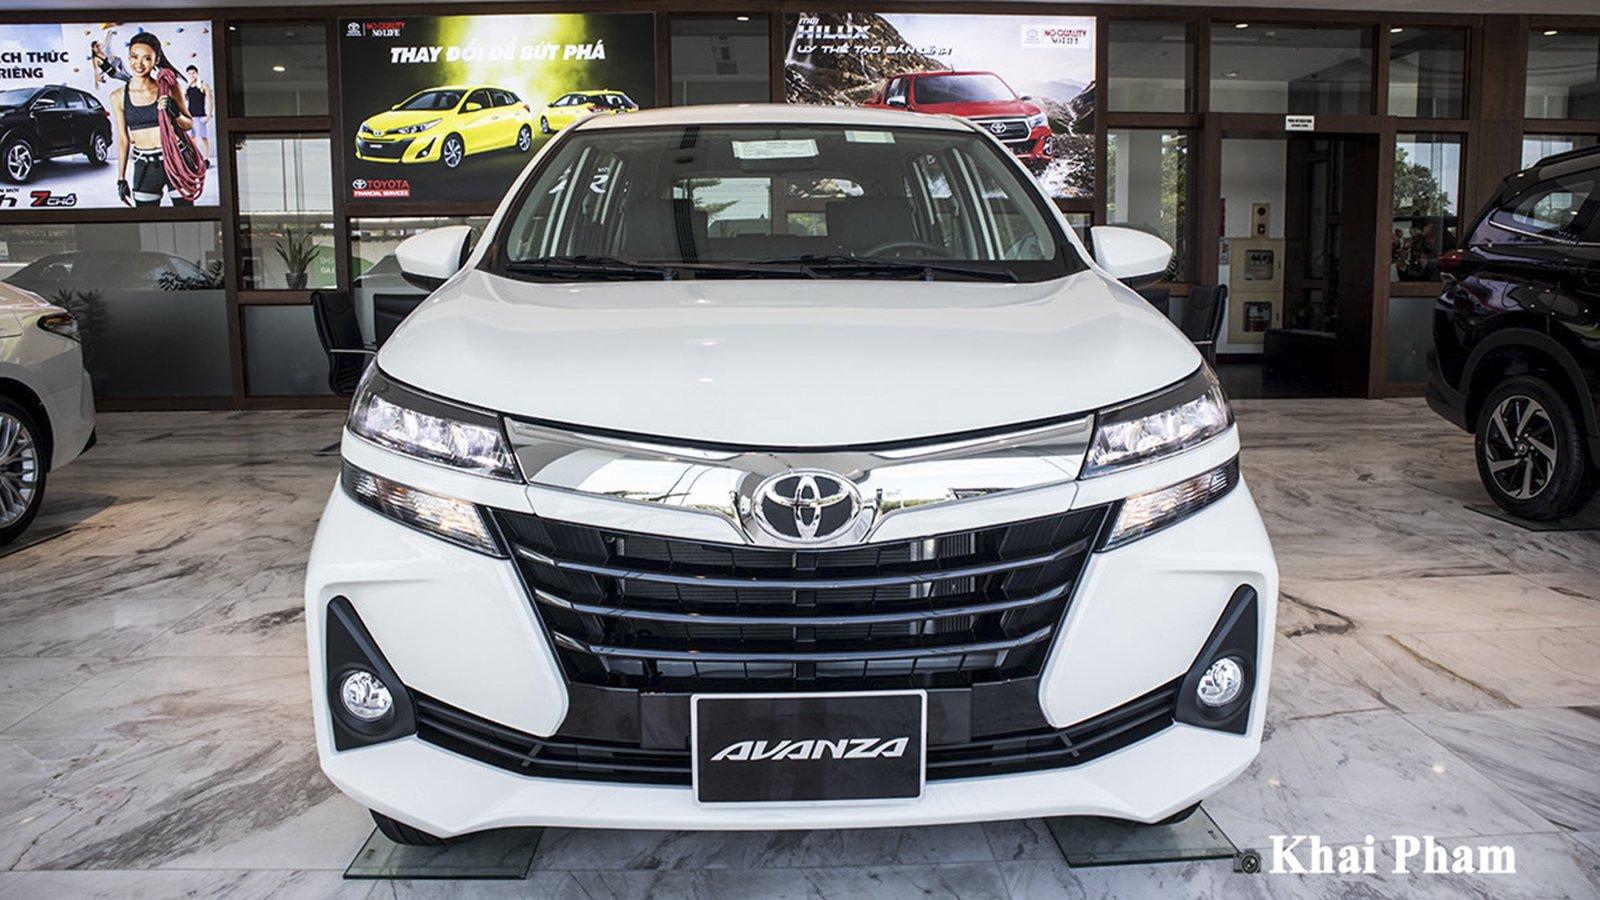 Ảnh đầu xe Toyota Avanza 2020